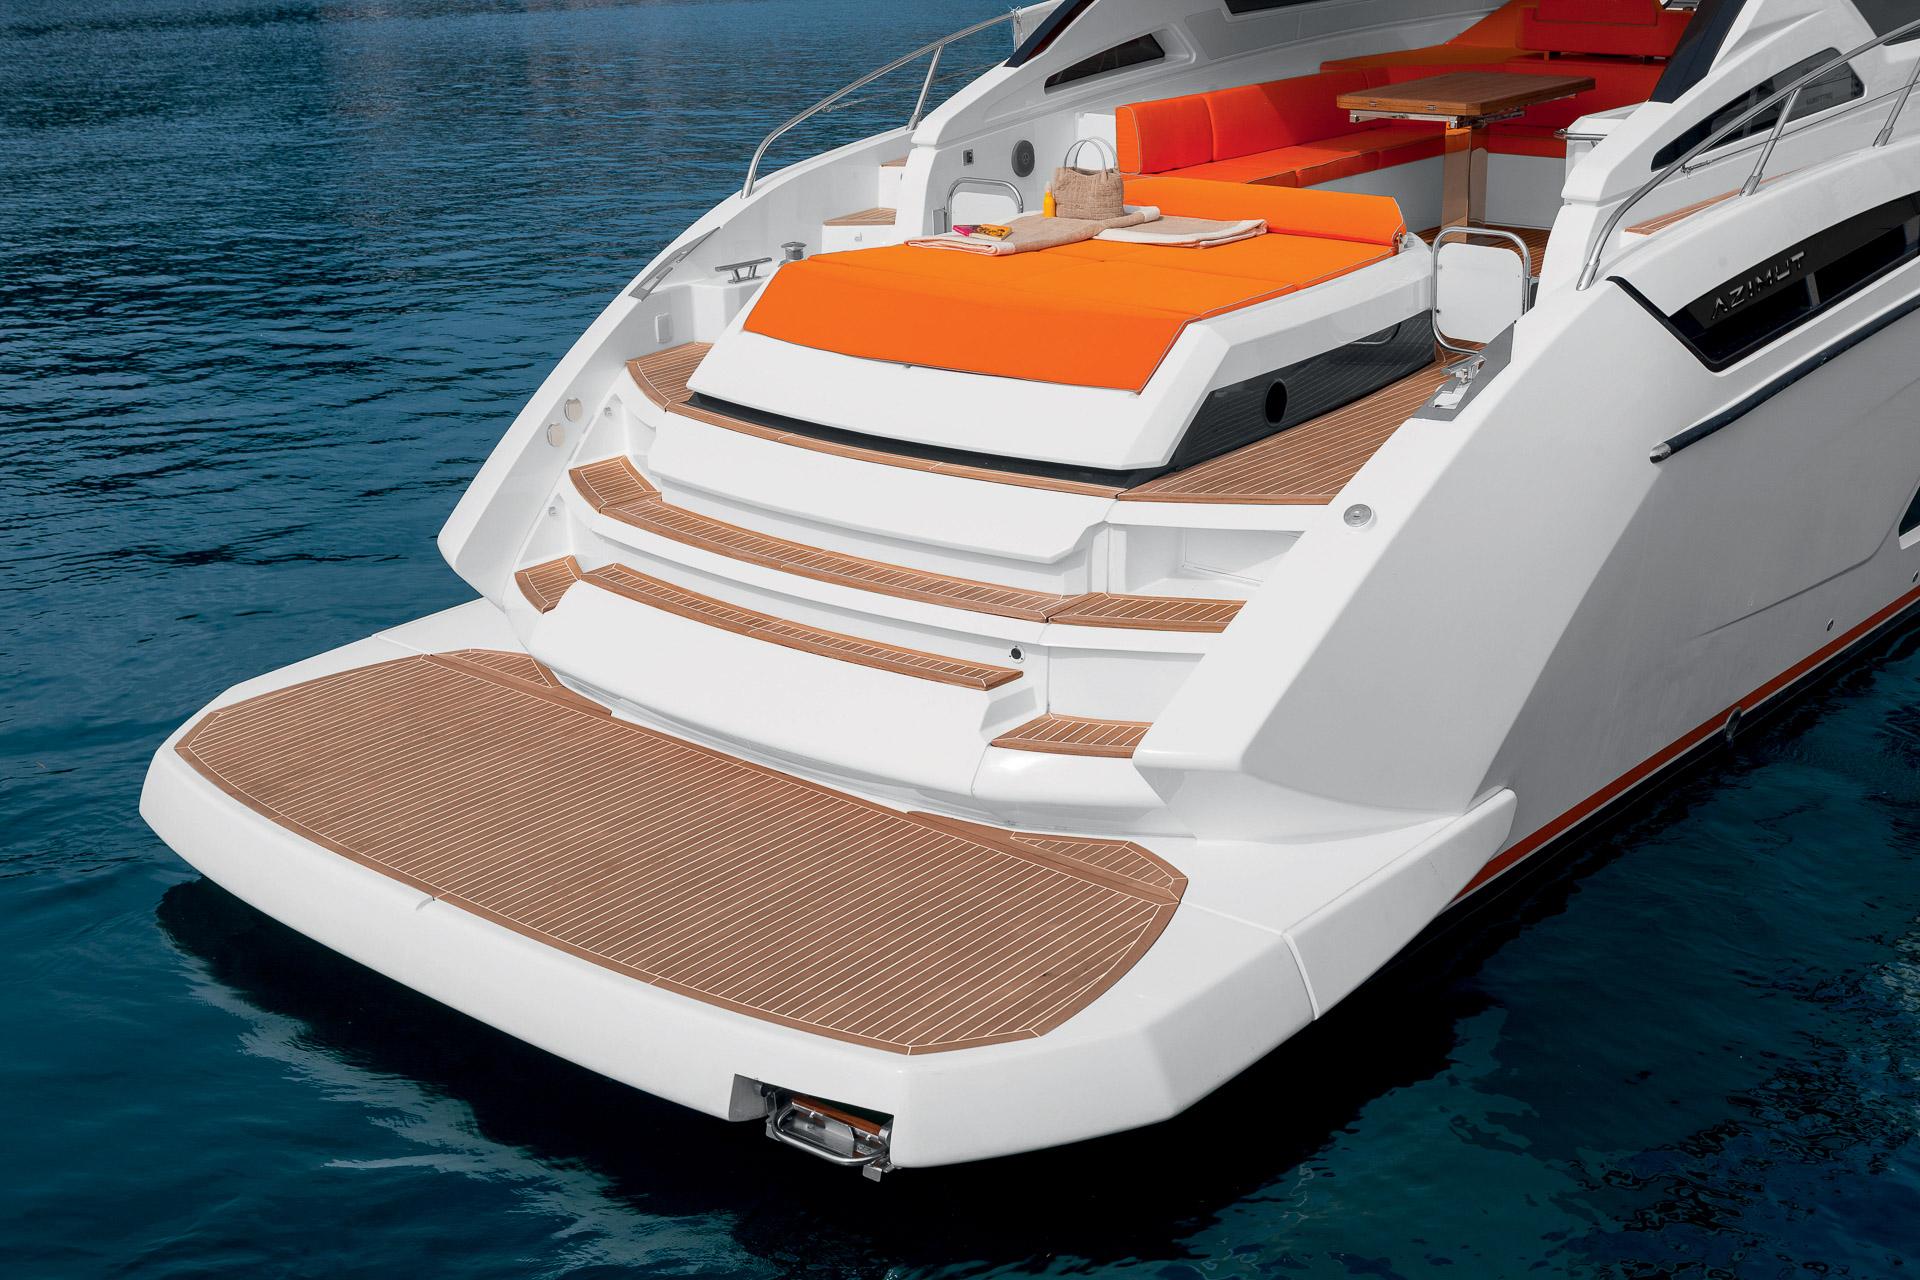 a58-bathing-platform